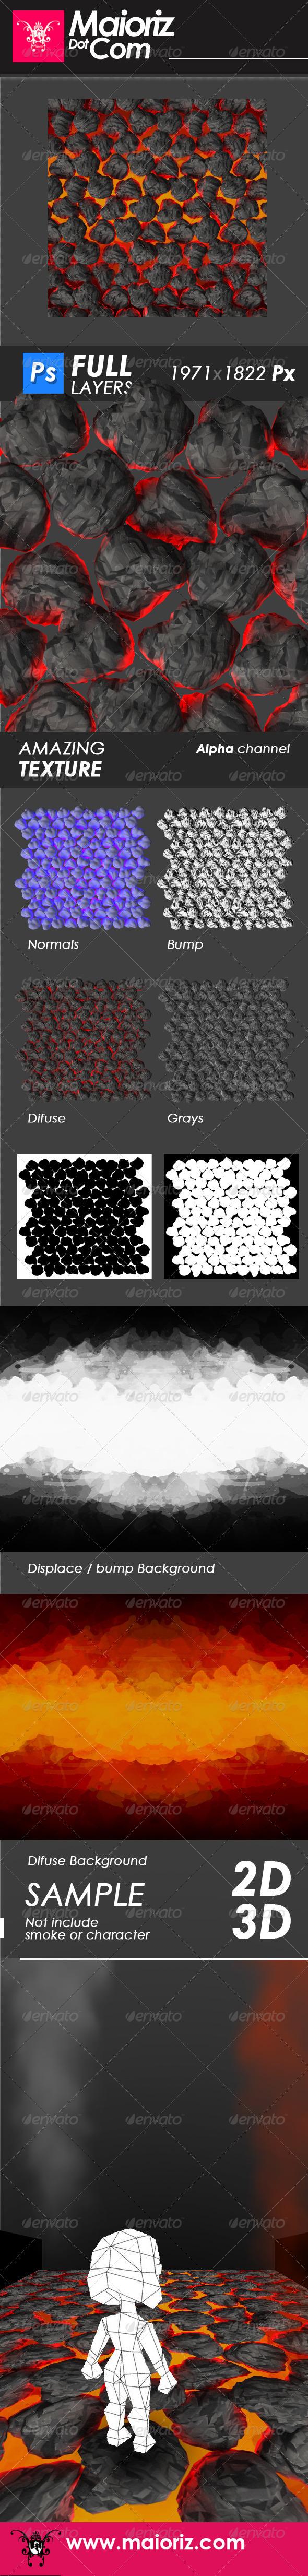 GraphicRiver Fire Rocks Texture 6688686